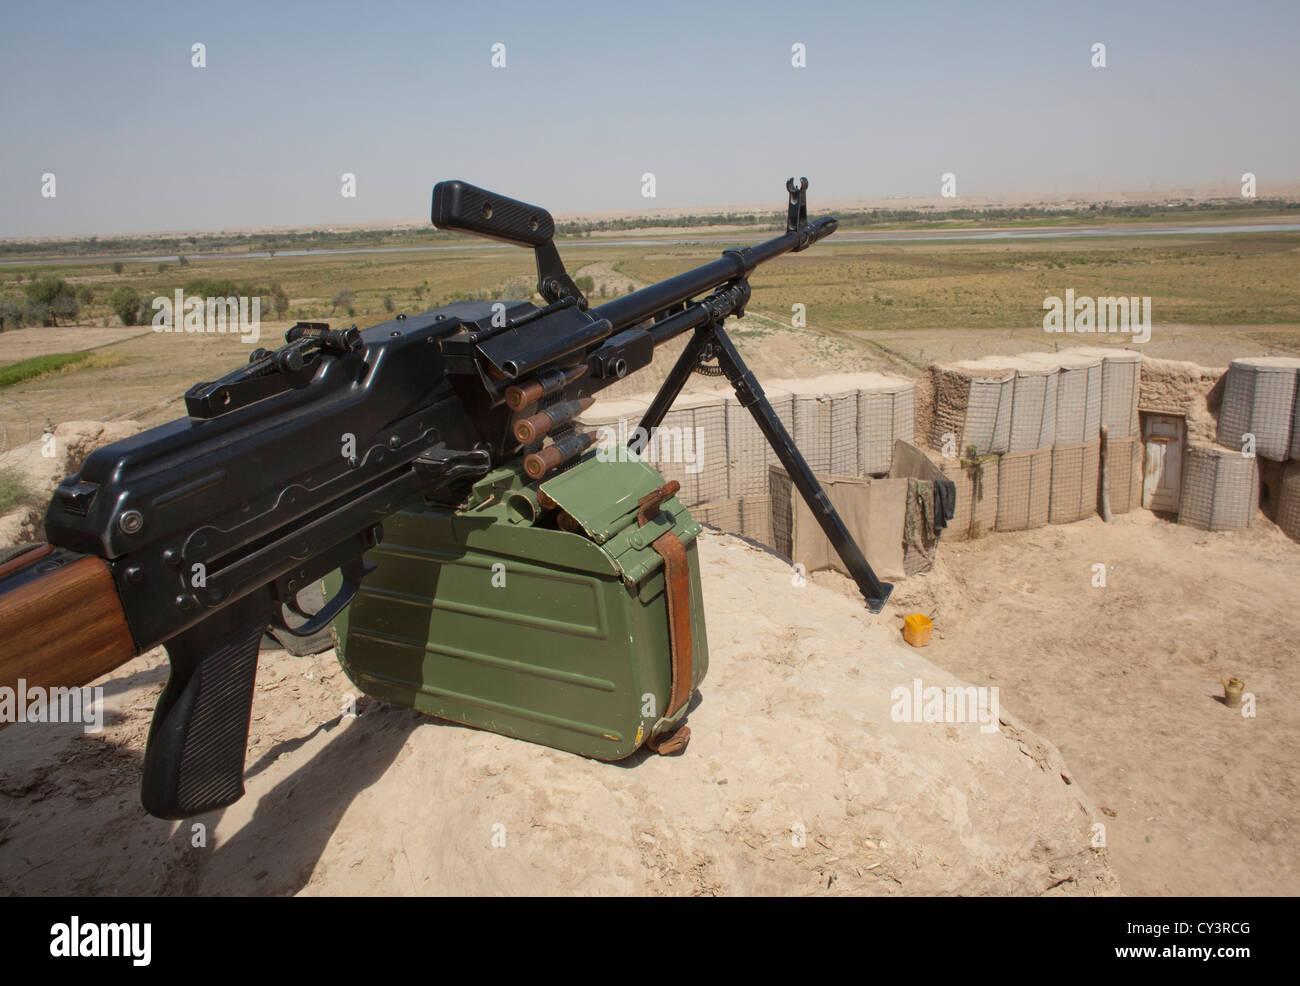 Estimated 10.000 Arbaki fighters(warlords) in Kunduz province. - Stock Image